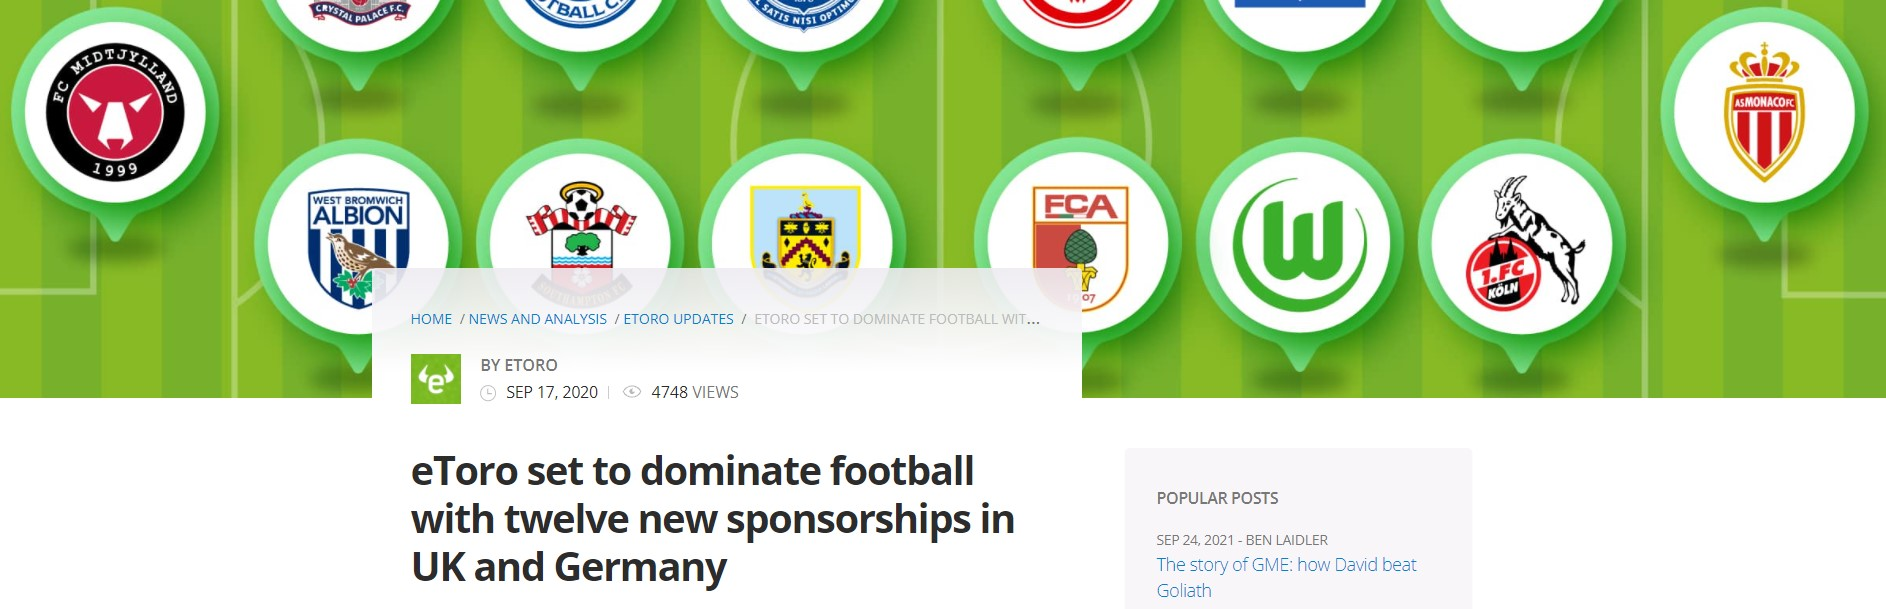 eToro neuer Sponsor von Arsenal London